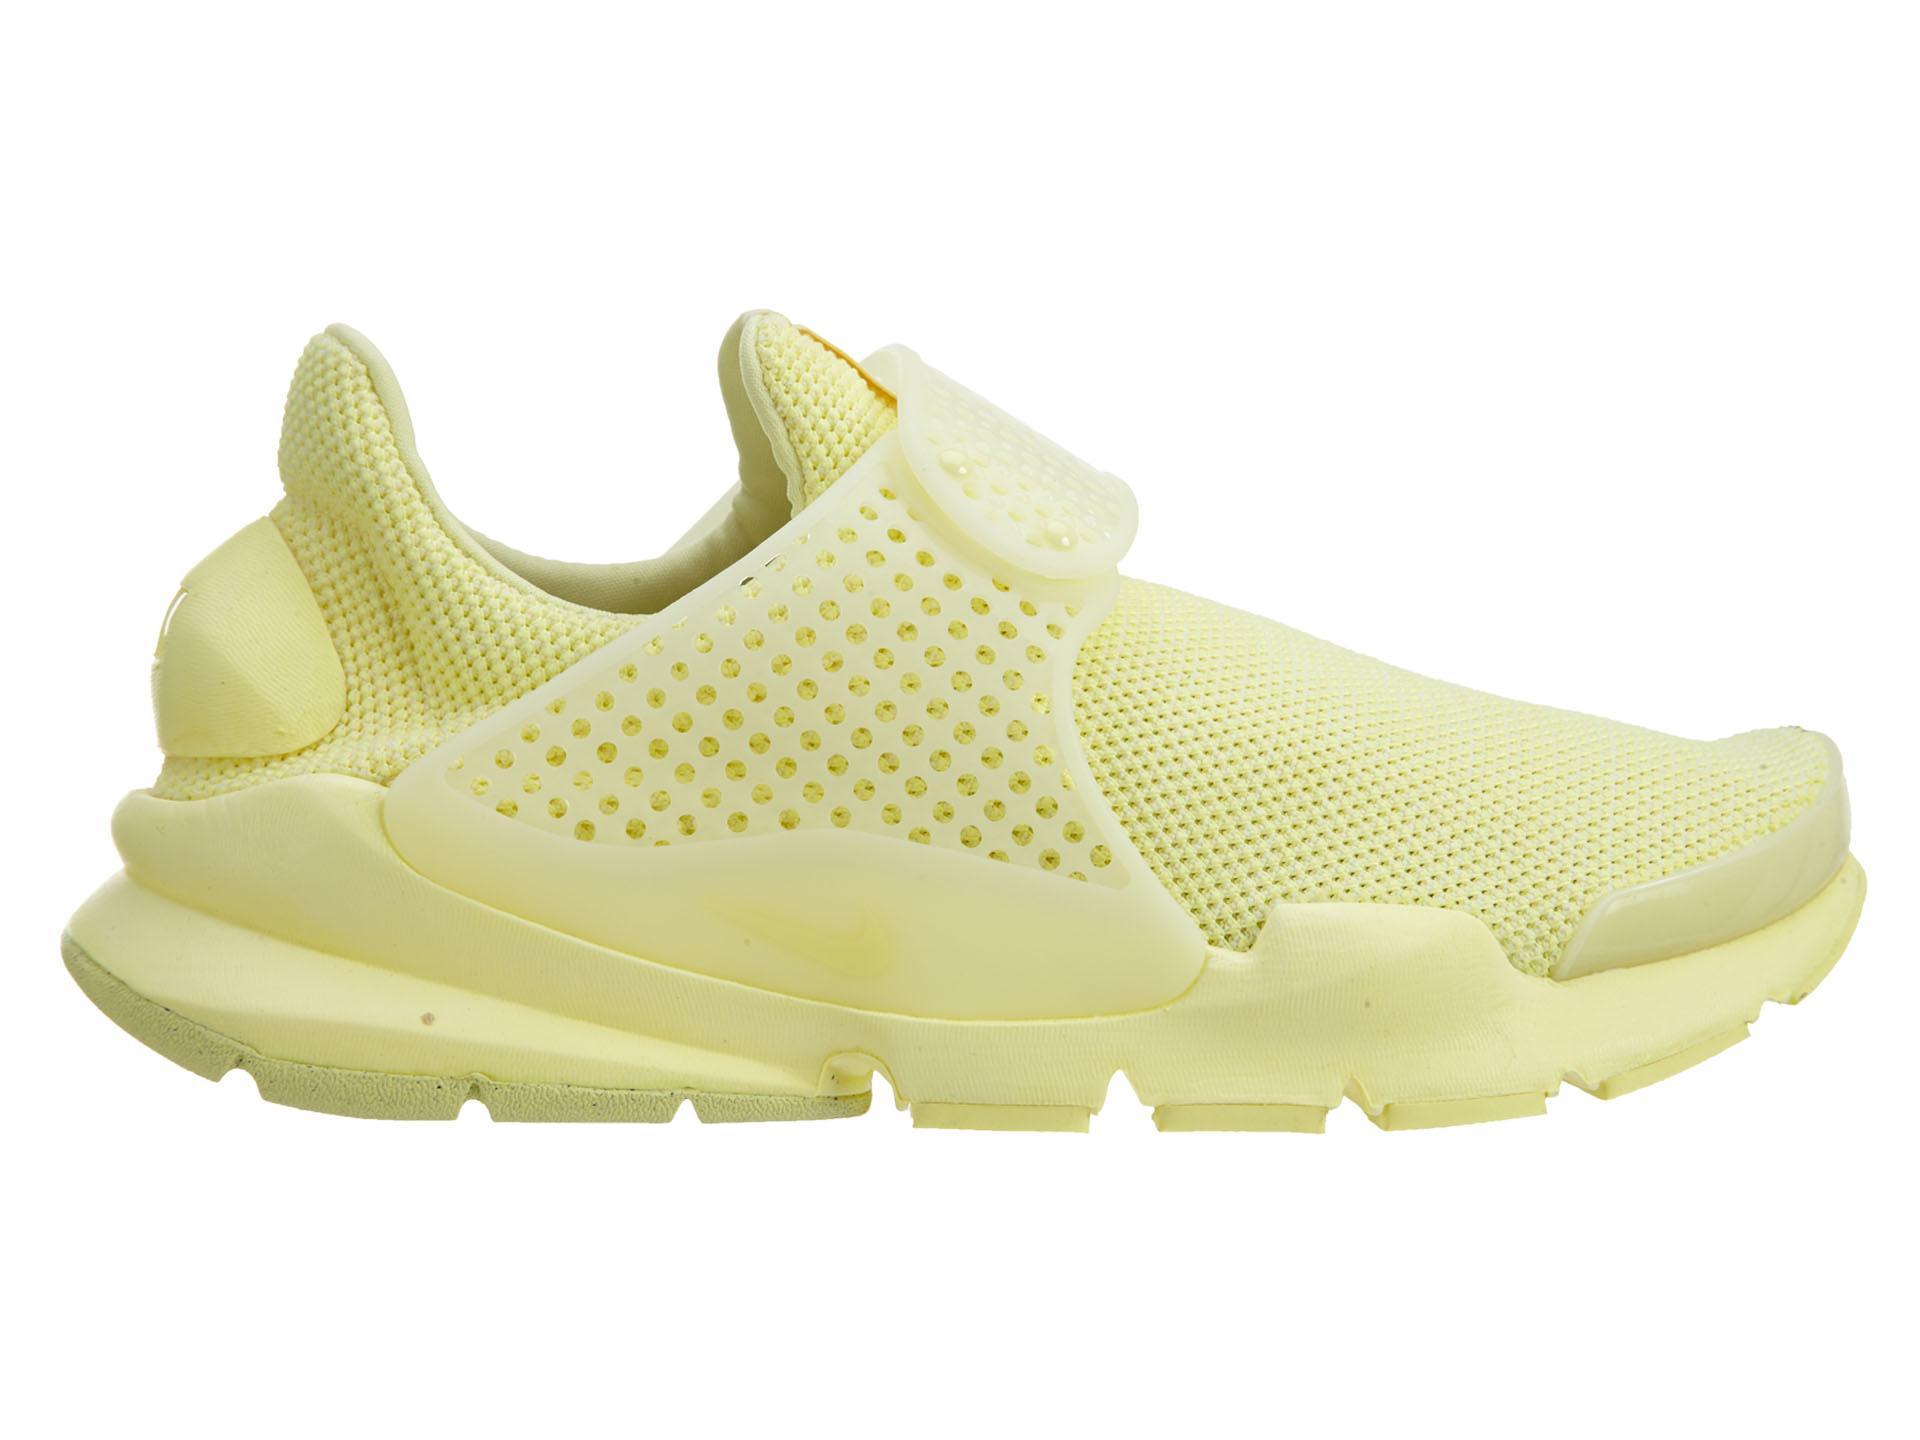 Nike Sock Dart Se Lemon Chiffon/Lemon